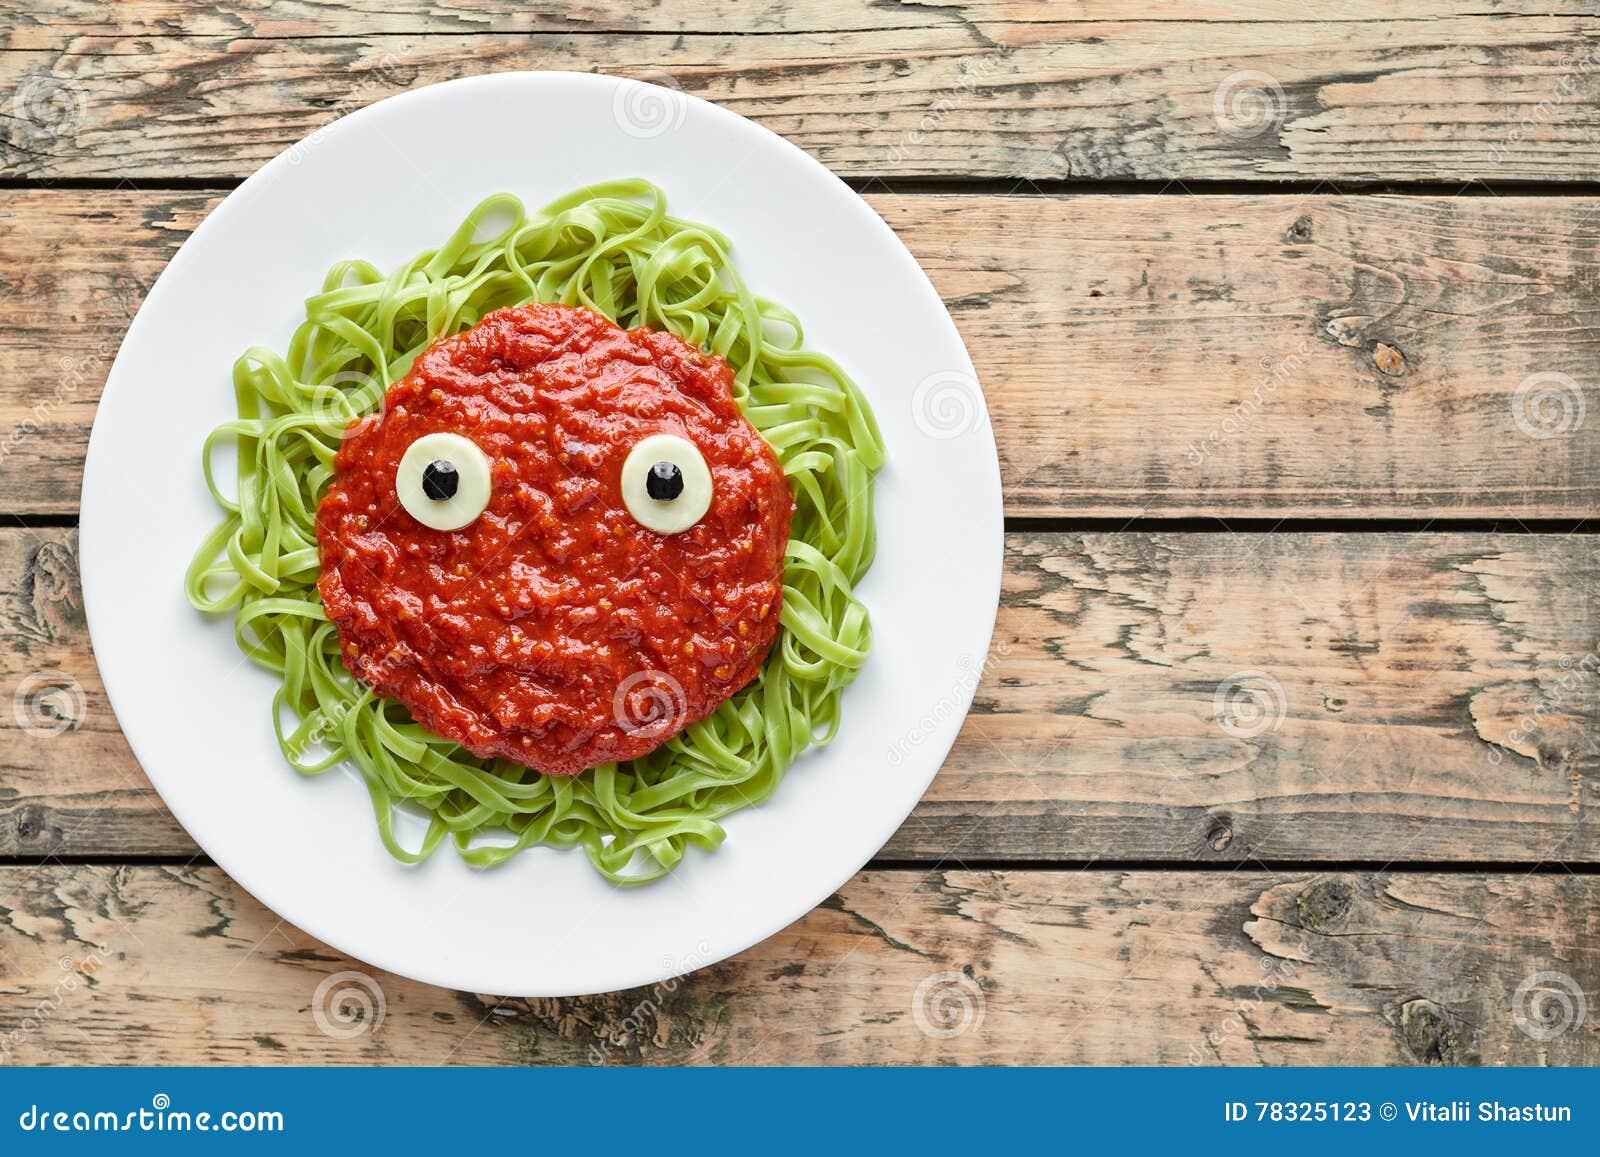 Spooky halloween monster green pasta with fake blood tomato sauce and mozzarella eyeballs